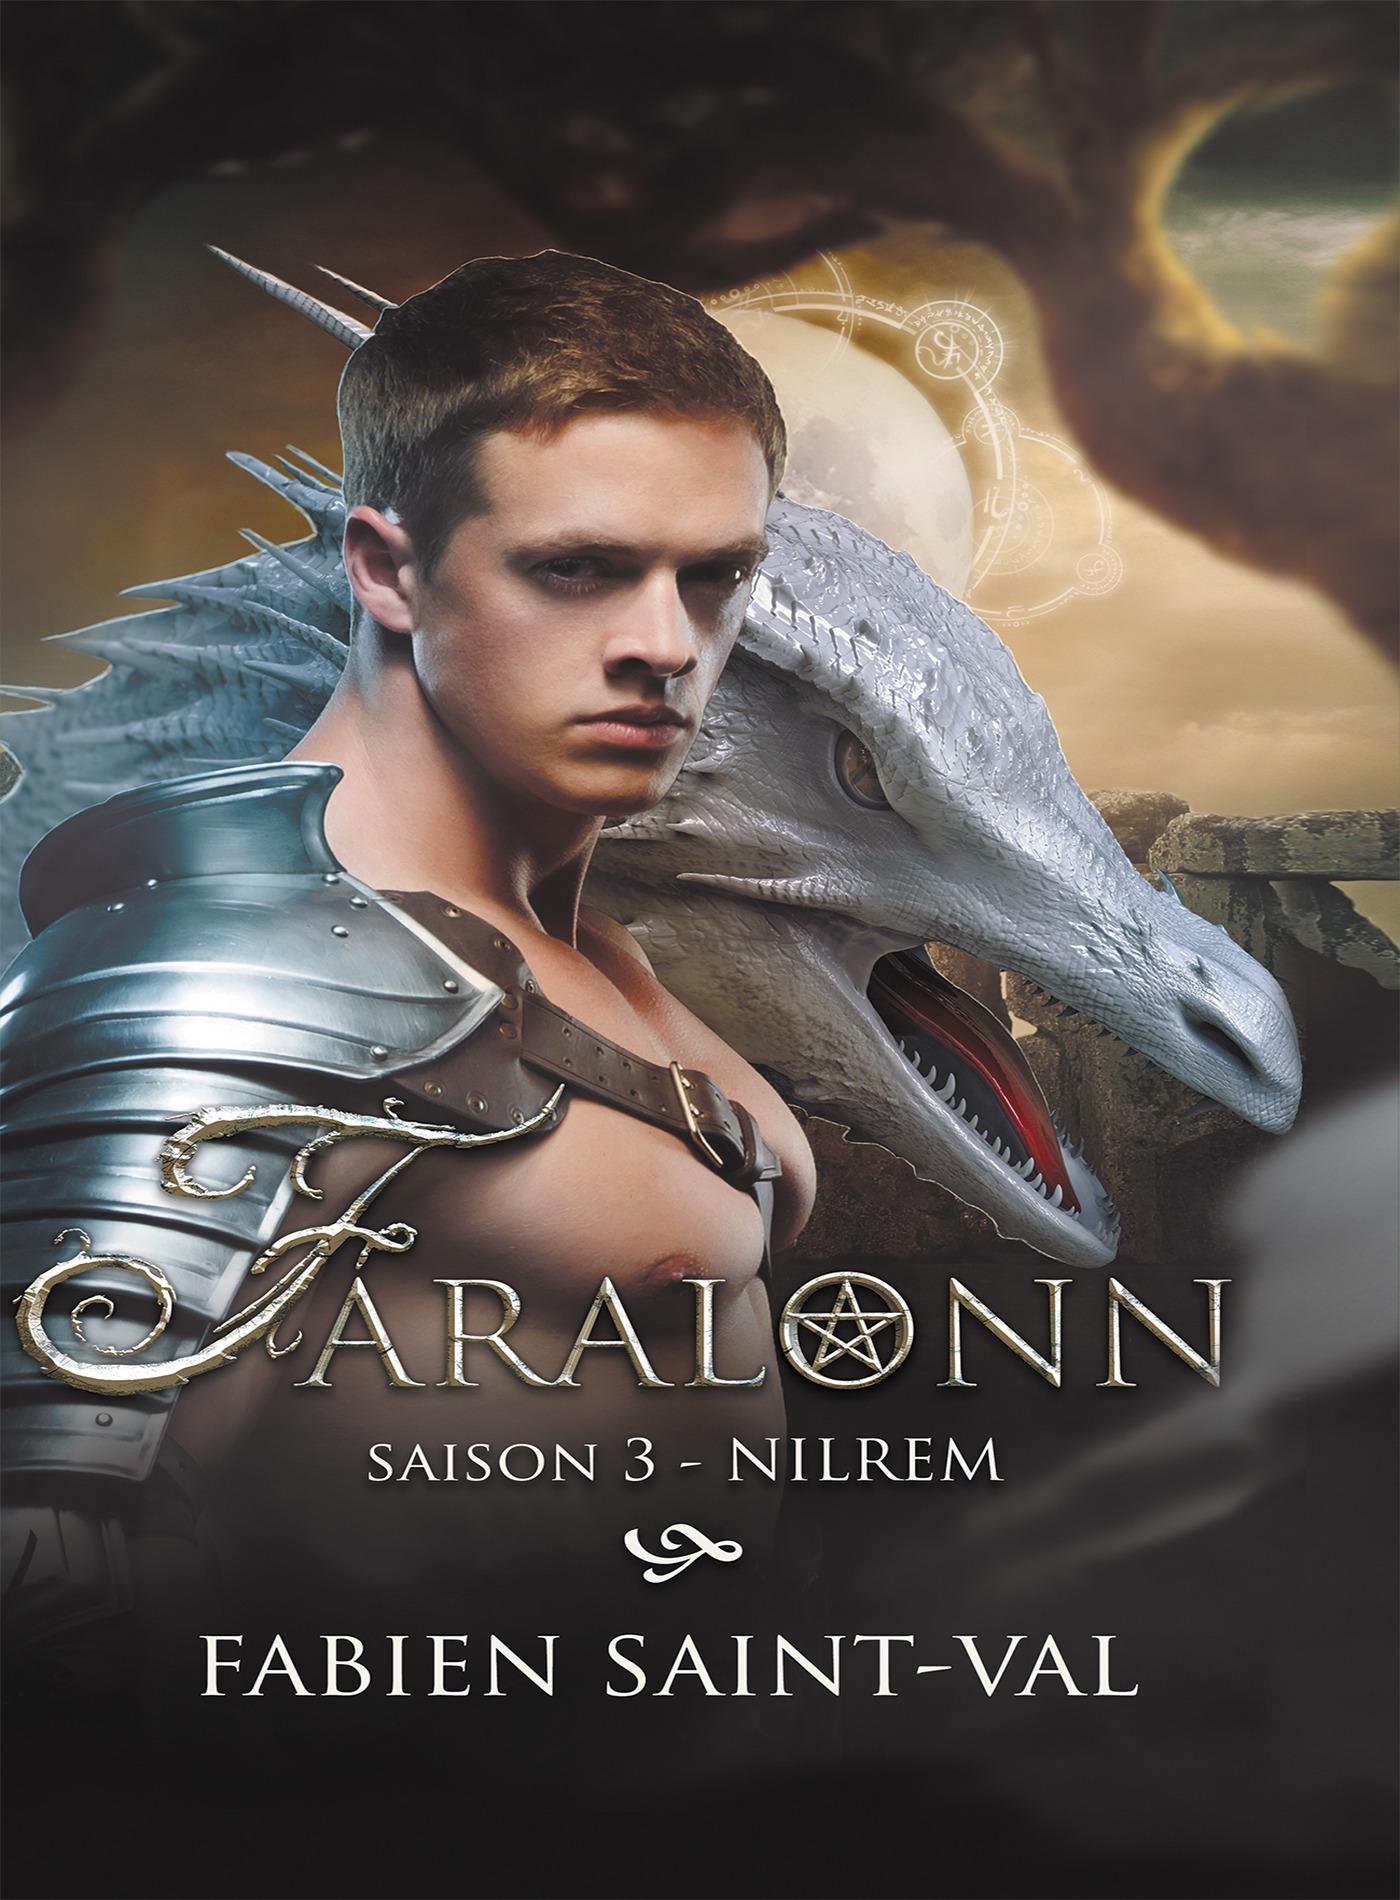 Faralonn saison 3, NILREM